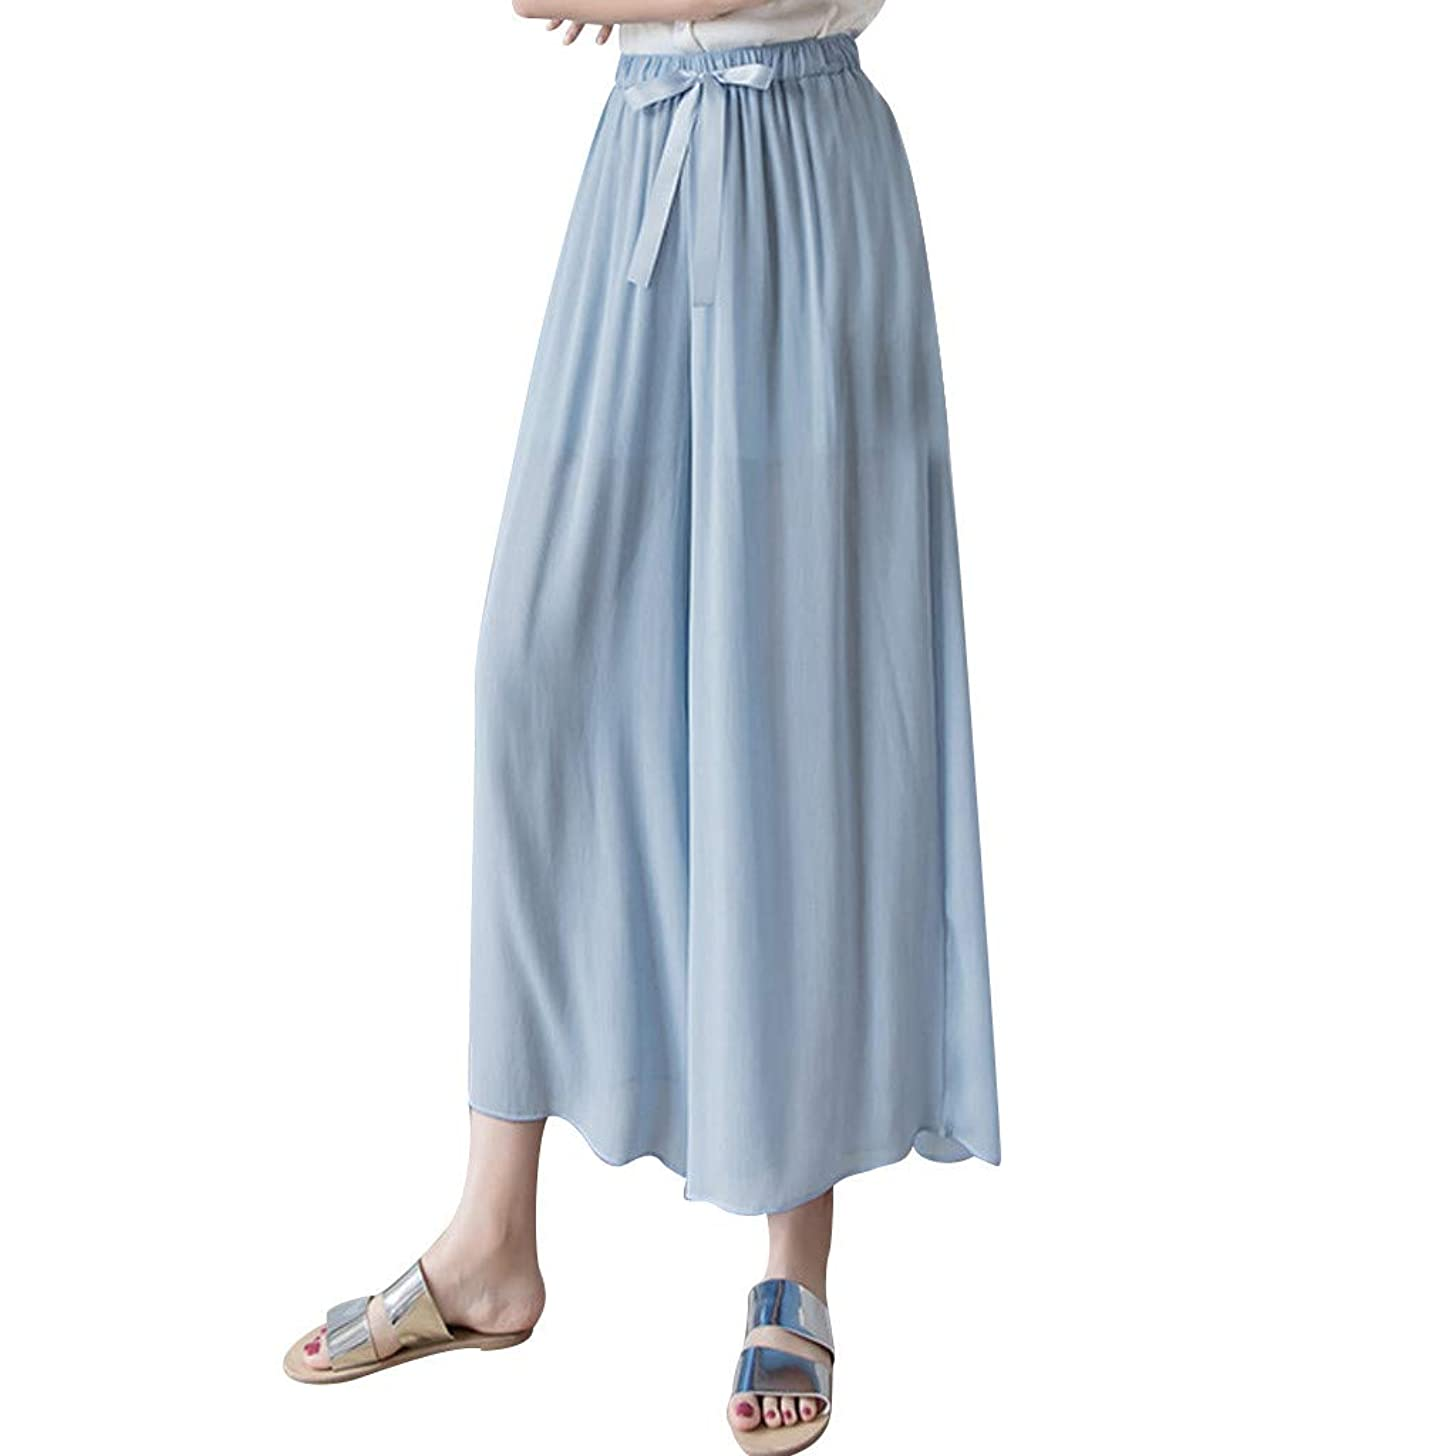 Fashion Women Chiffon Elastic High Casual Pant Wide Leg Beach Trouser Hotkey Yoga Pants for Women Plus Size